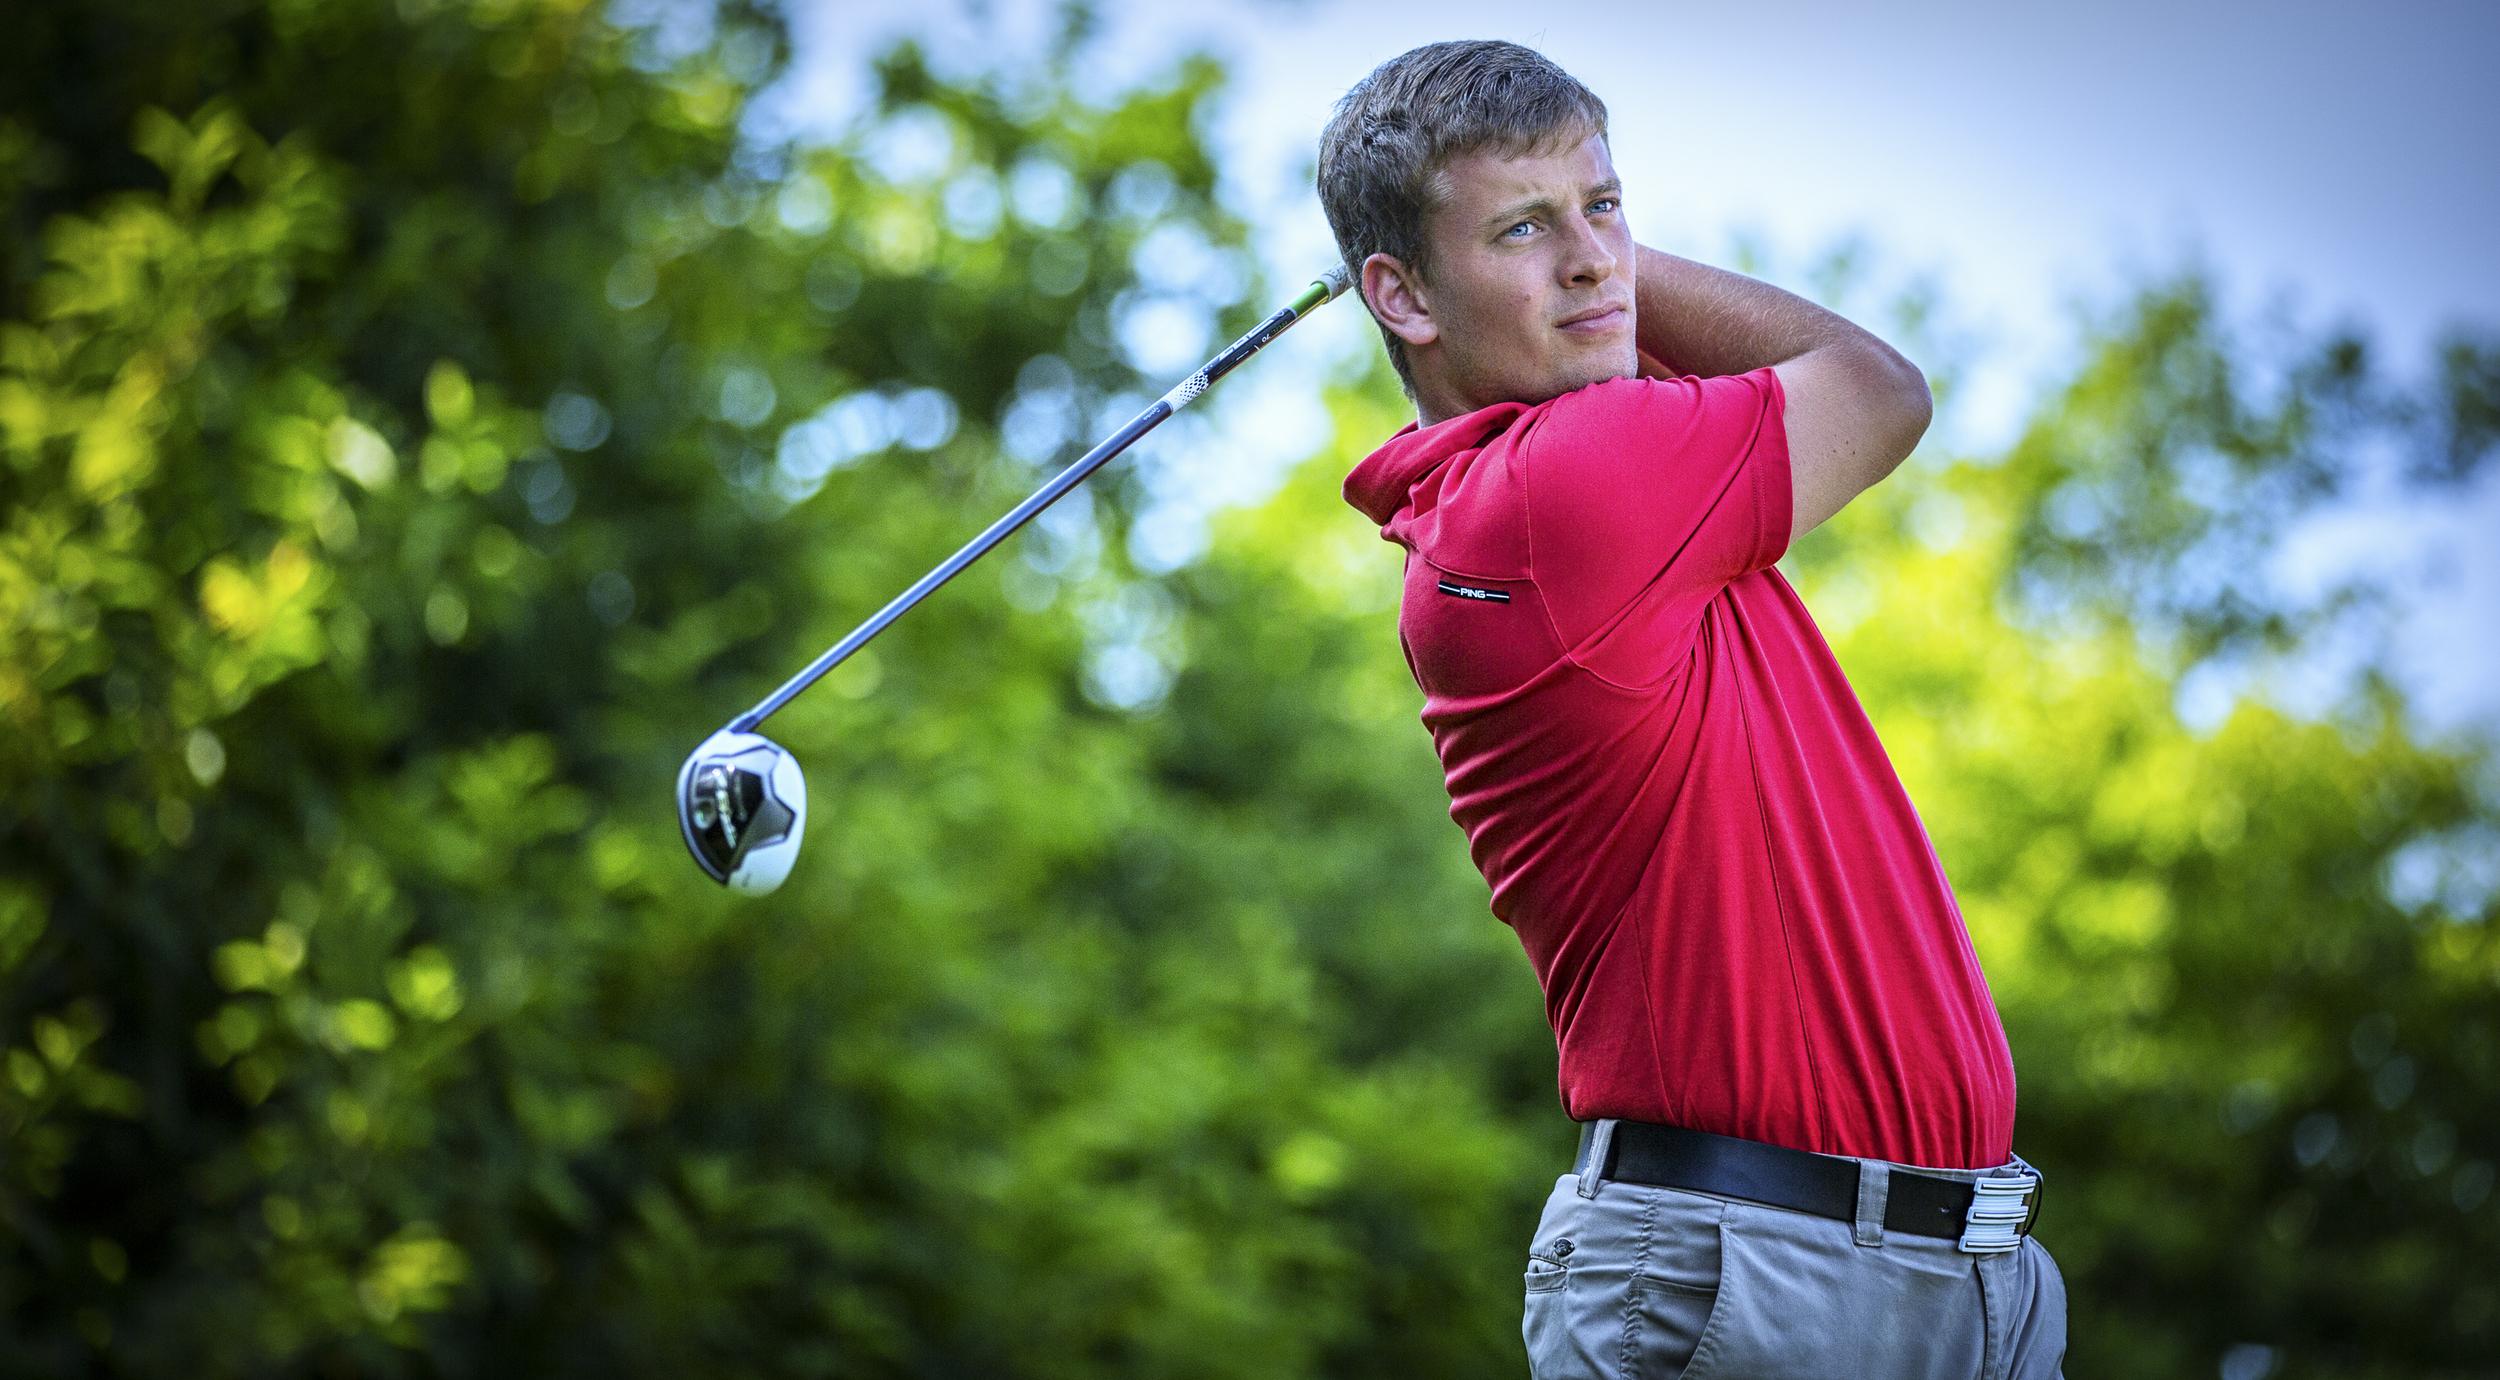 Ben Lobacz Future Golf Professional